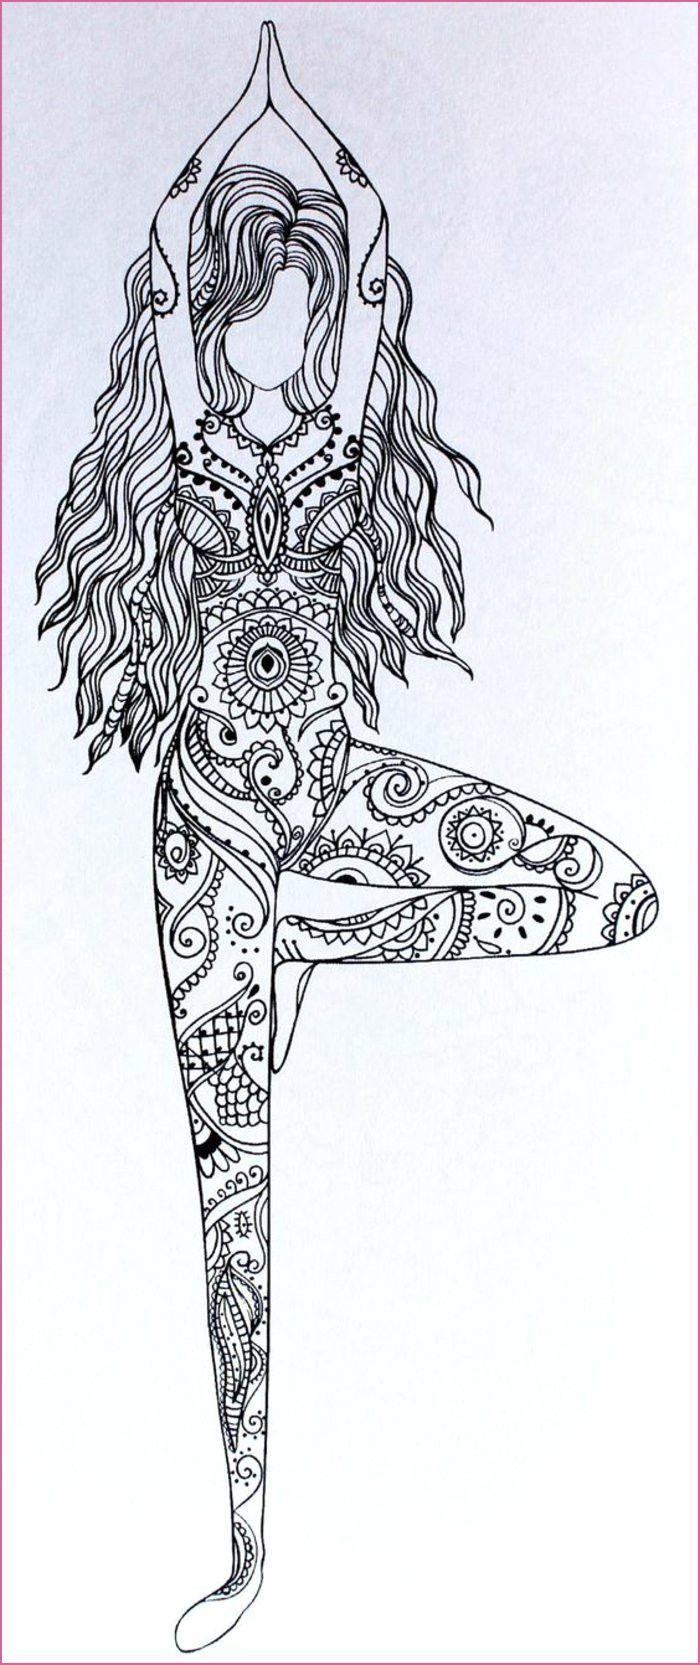 Haaren Langen Madchen Mit Madchen Mit Langen Haaren Madchen Mit Langen Haaren Madchen Mit Lang Mandala Design Art Mandala Drawing Doodle Art Designs